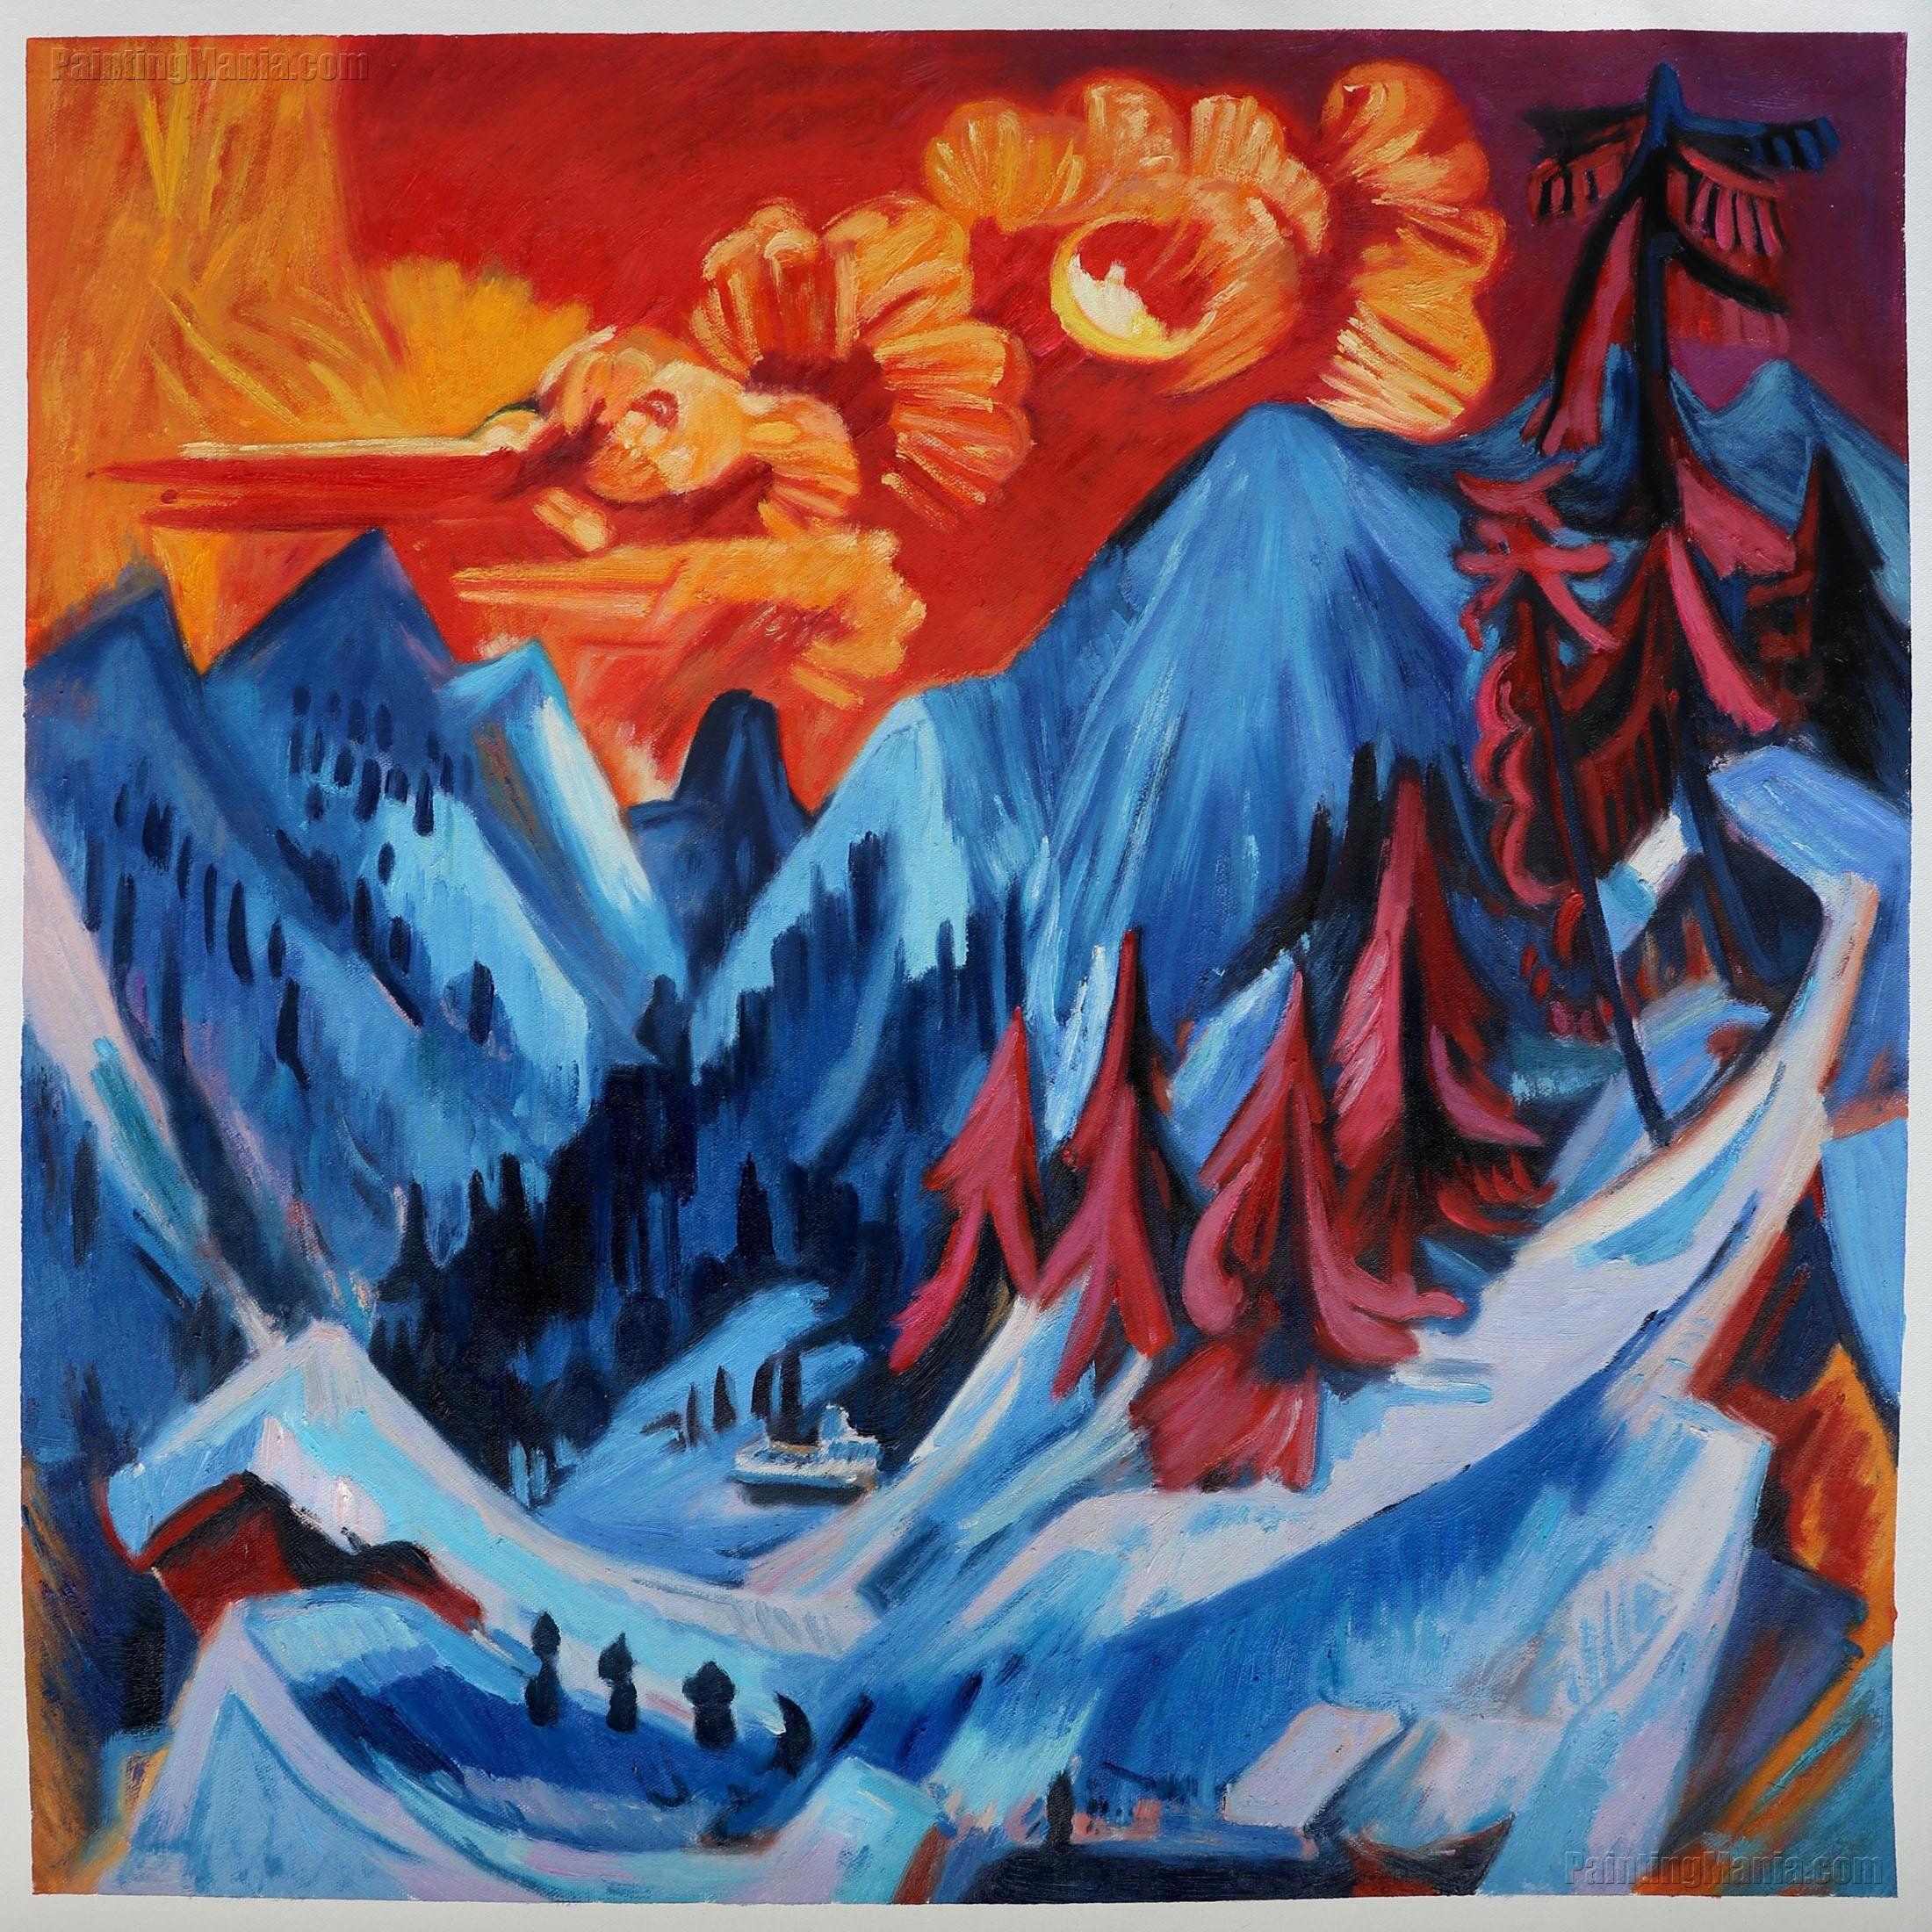 Mountain Lake Salvador Dali Reproduction Art Print A4 A3 A2 A1